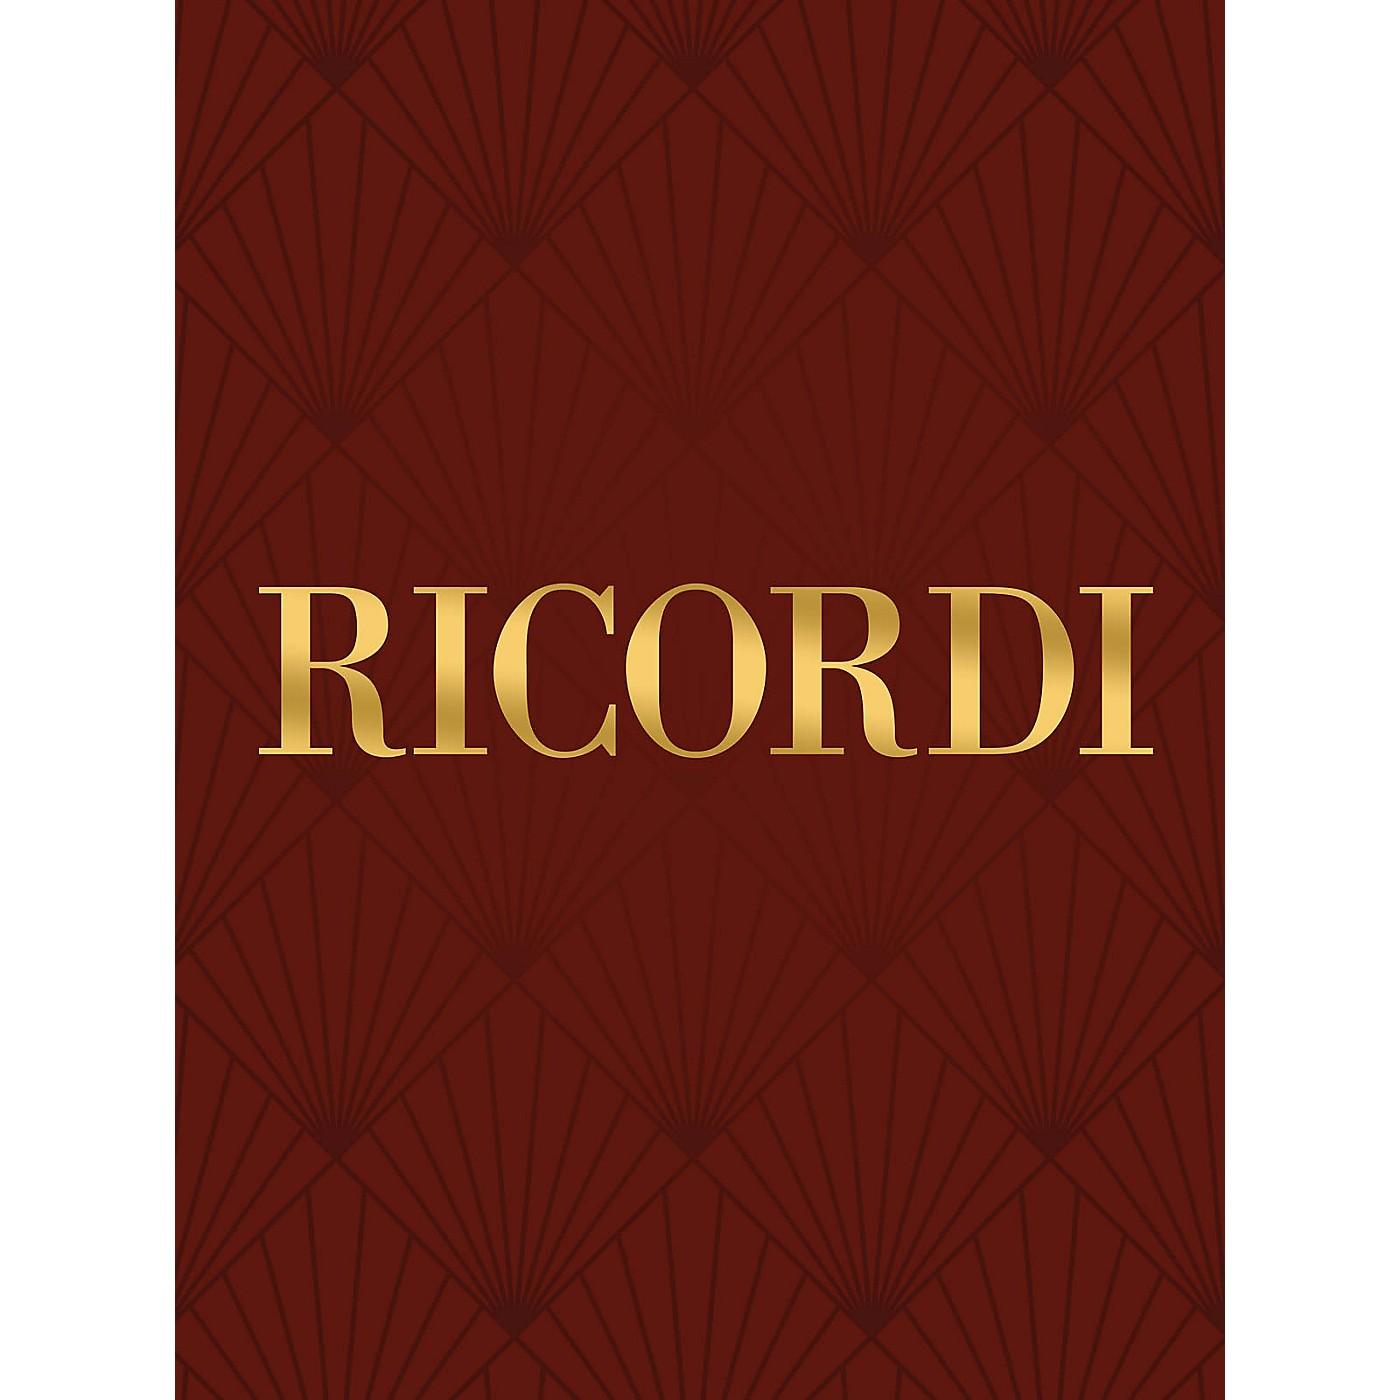 Ricordi Stabat Mater RV621 (Vocal Score) Composed by Antonio Vivaldi Edited by Vilmos Lesko thumbnail